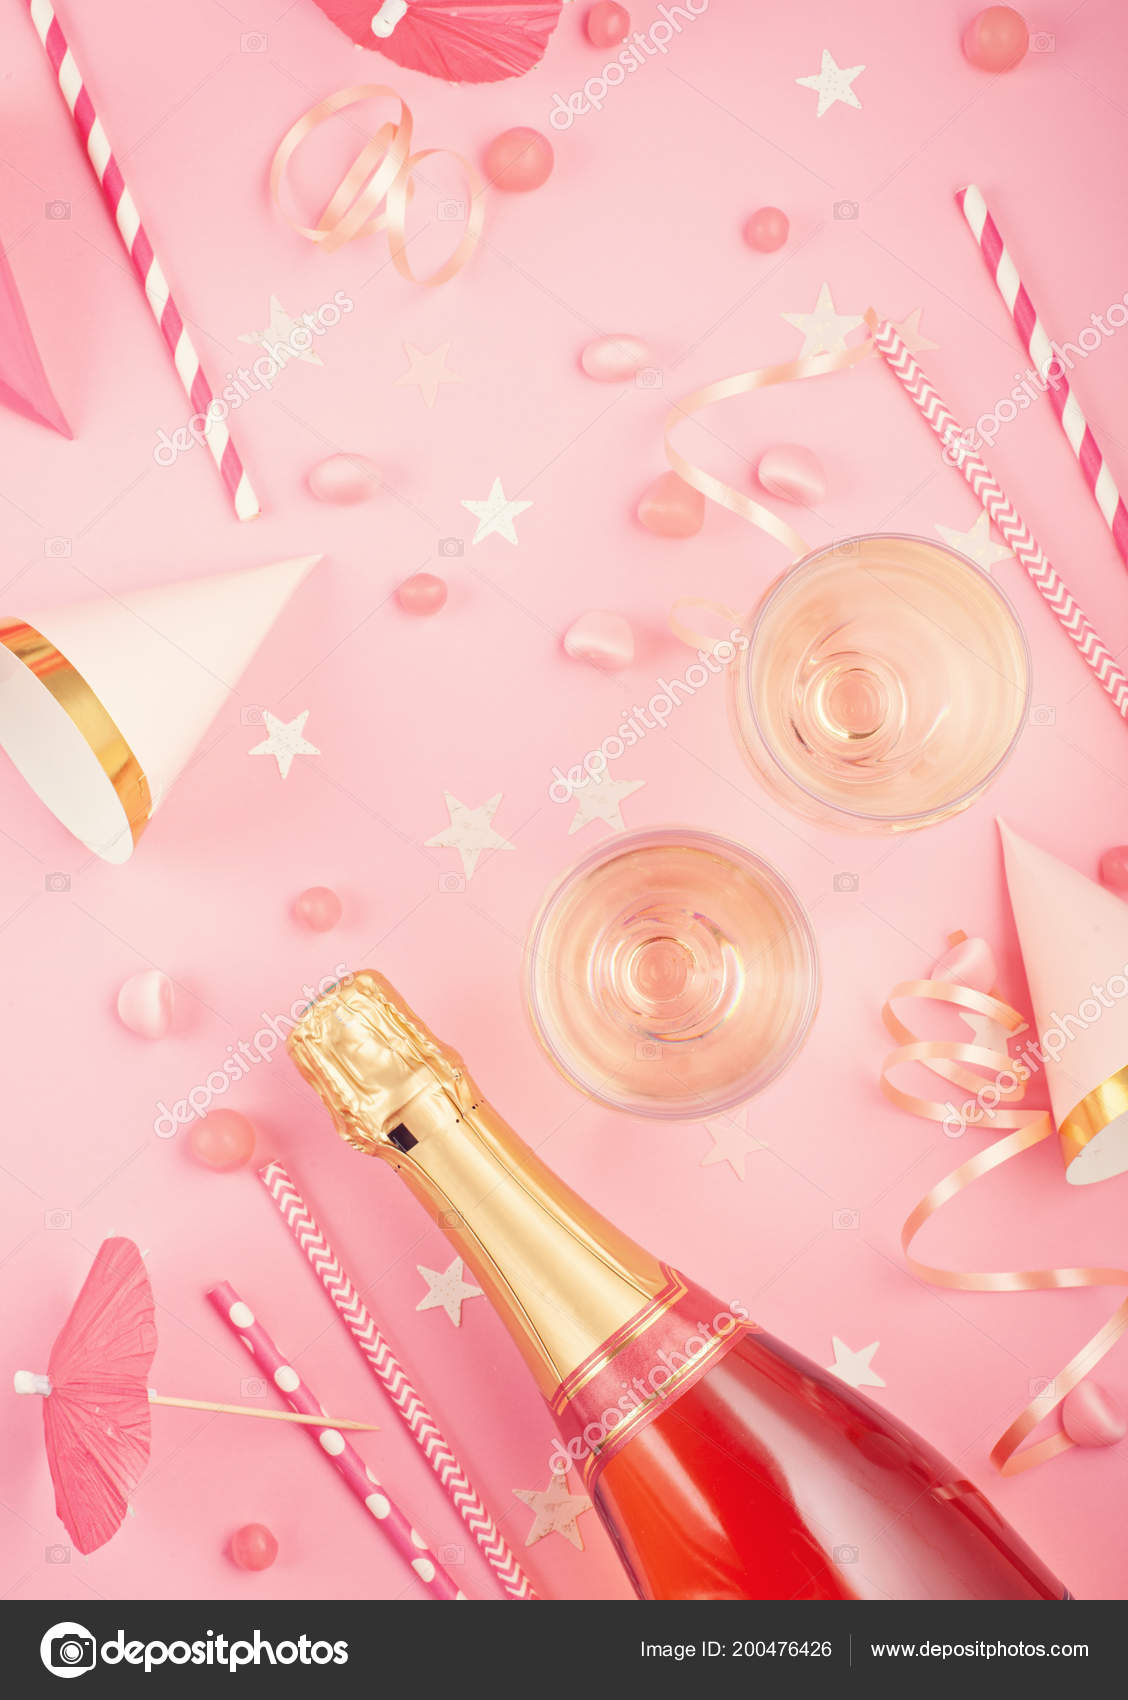 Girls party accessories pink background invitation birthday girls party accessories pink background invitation birthday bachelorette party baby fotografia de stock stopboris Images